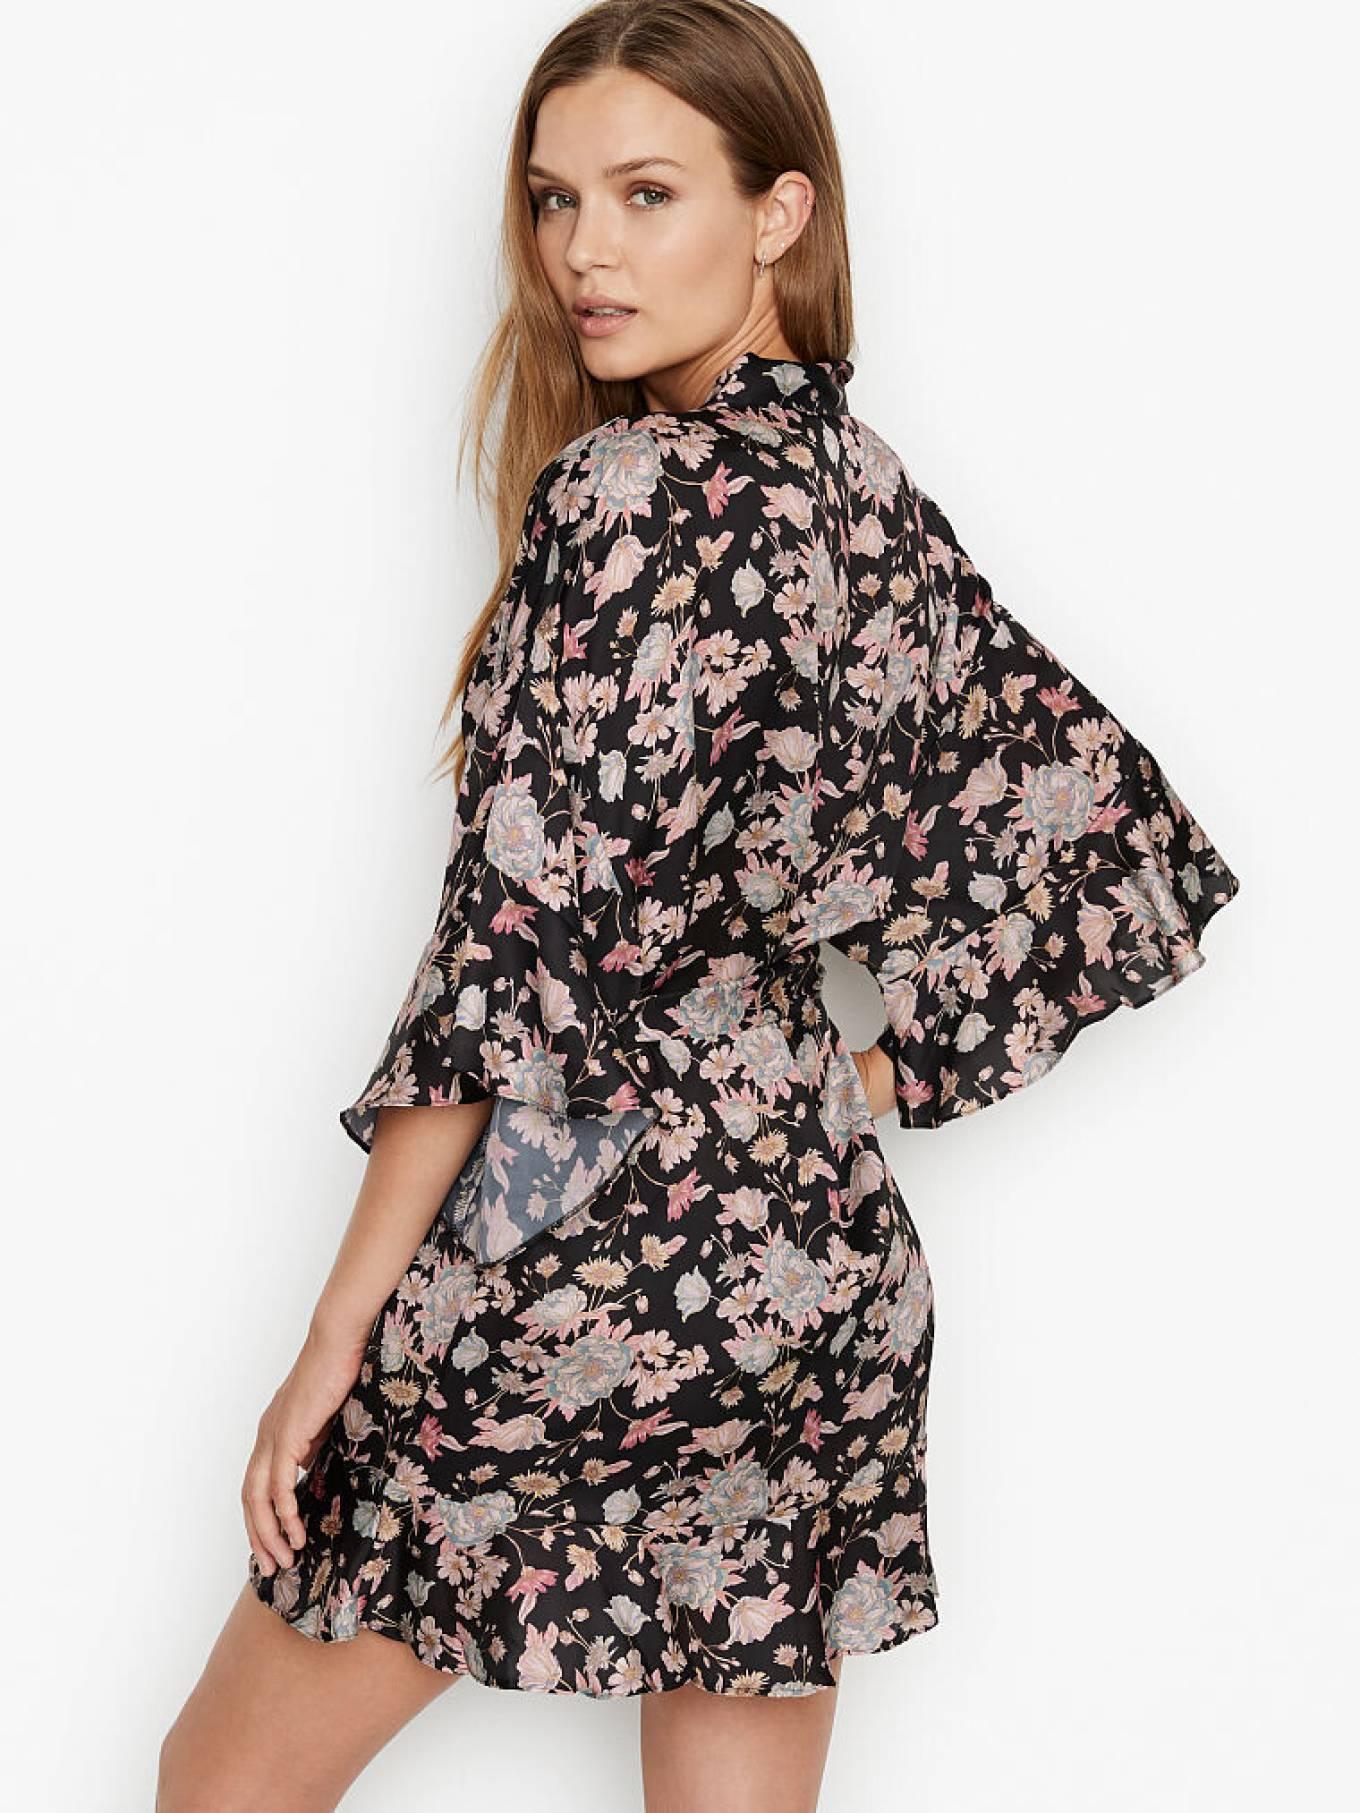 Josephine Skriver 2020 : Josephine Skriver – Victorias Secret – September 2020-01